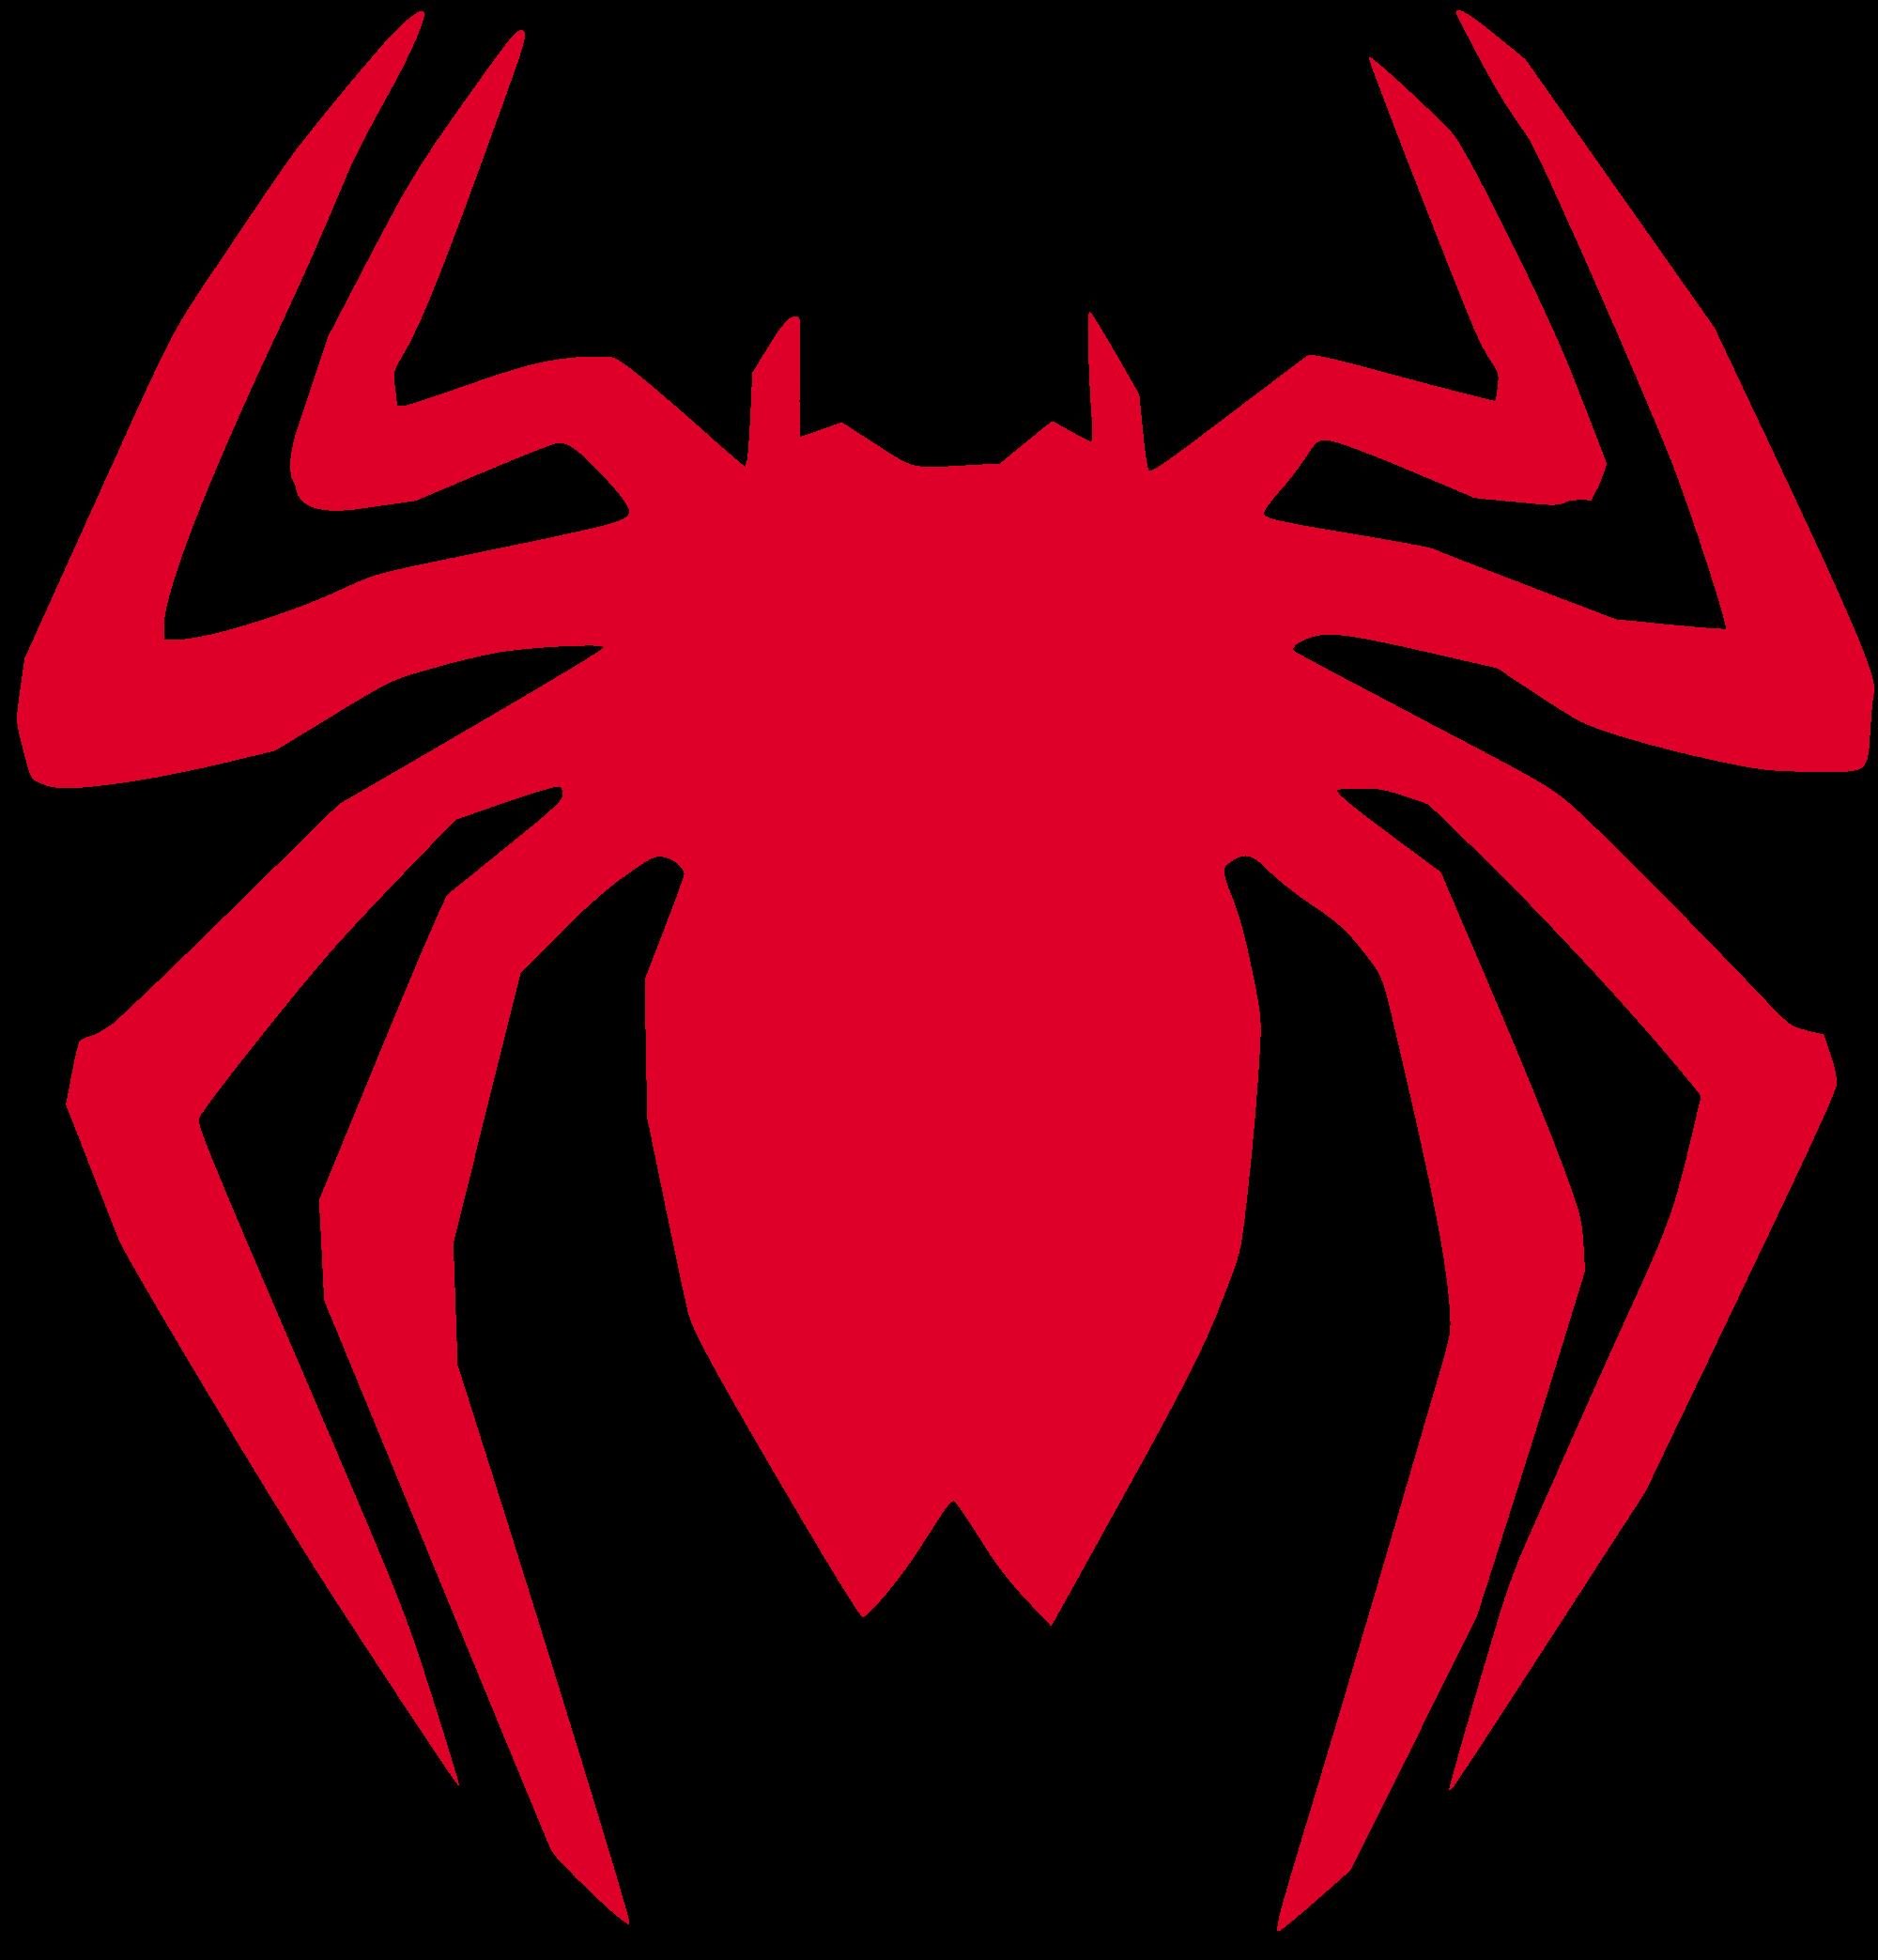 Spider Man 2002 Logos